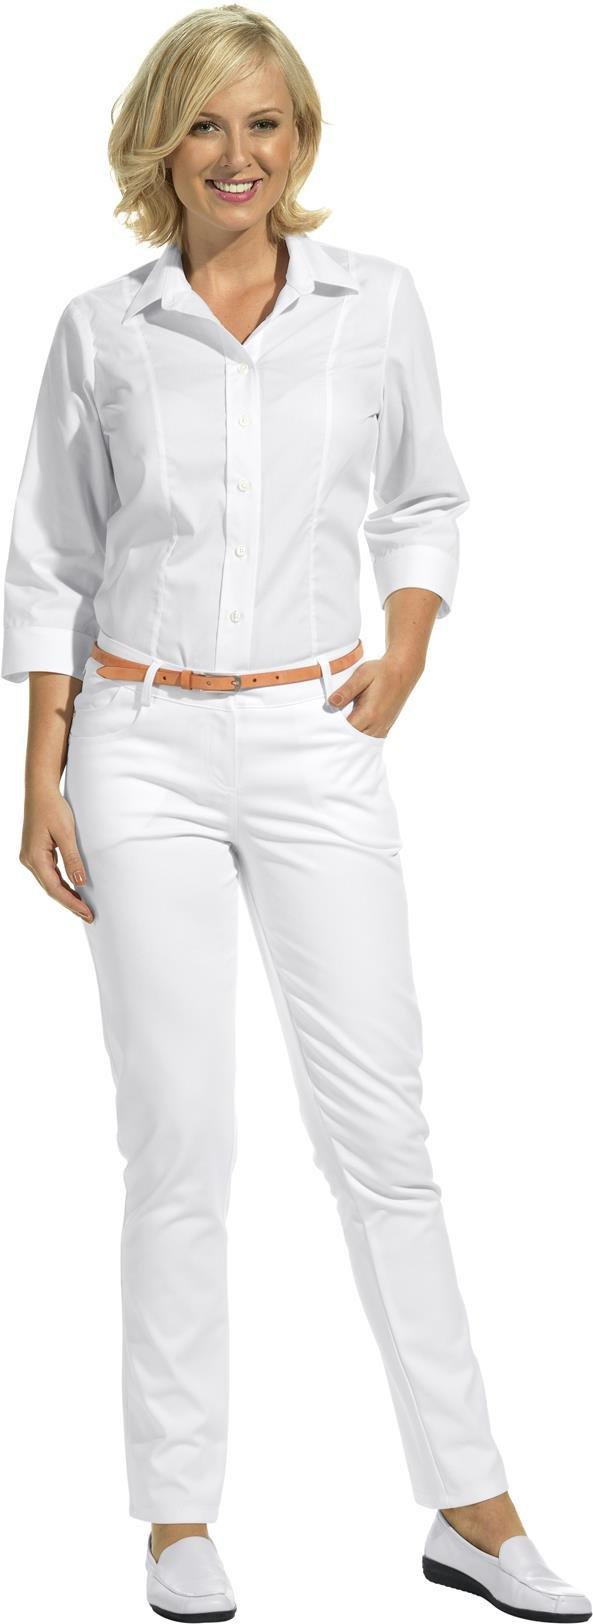 Camicia da donna 3/4Arm, Leiber, marrone, 38